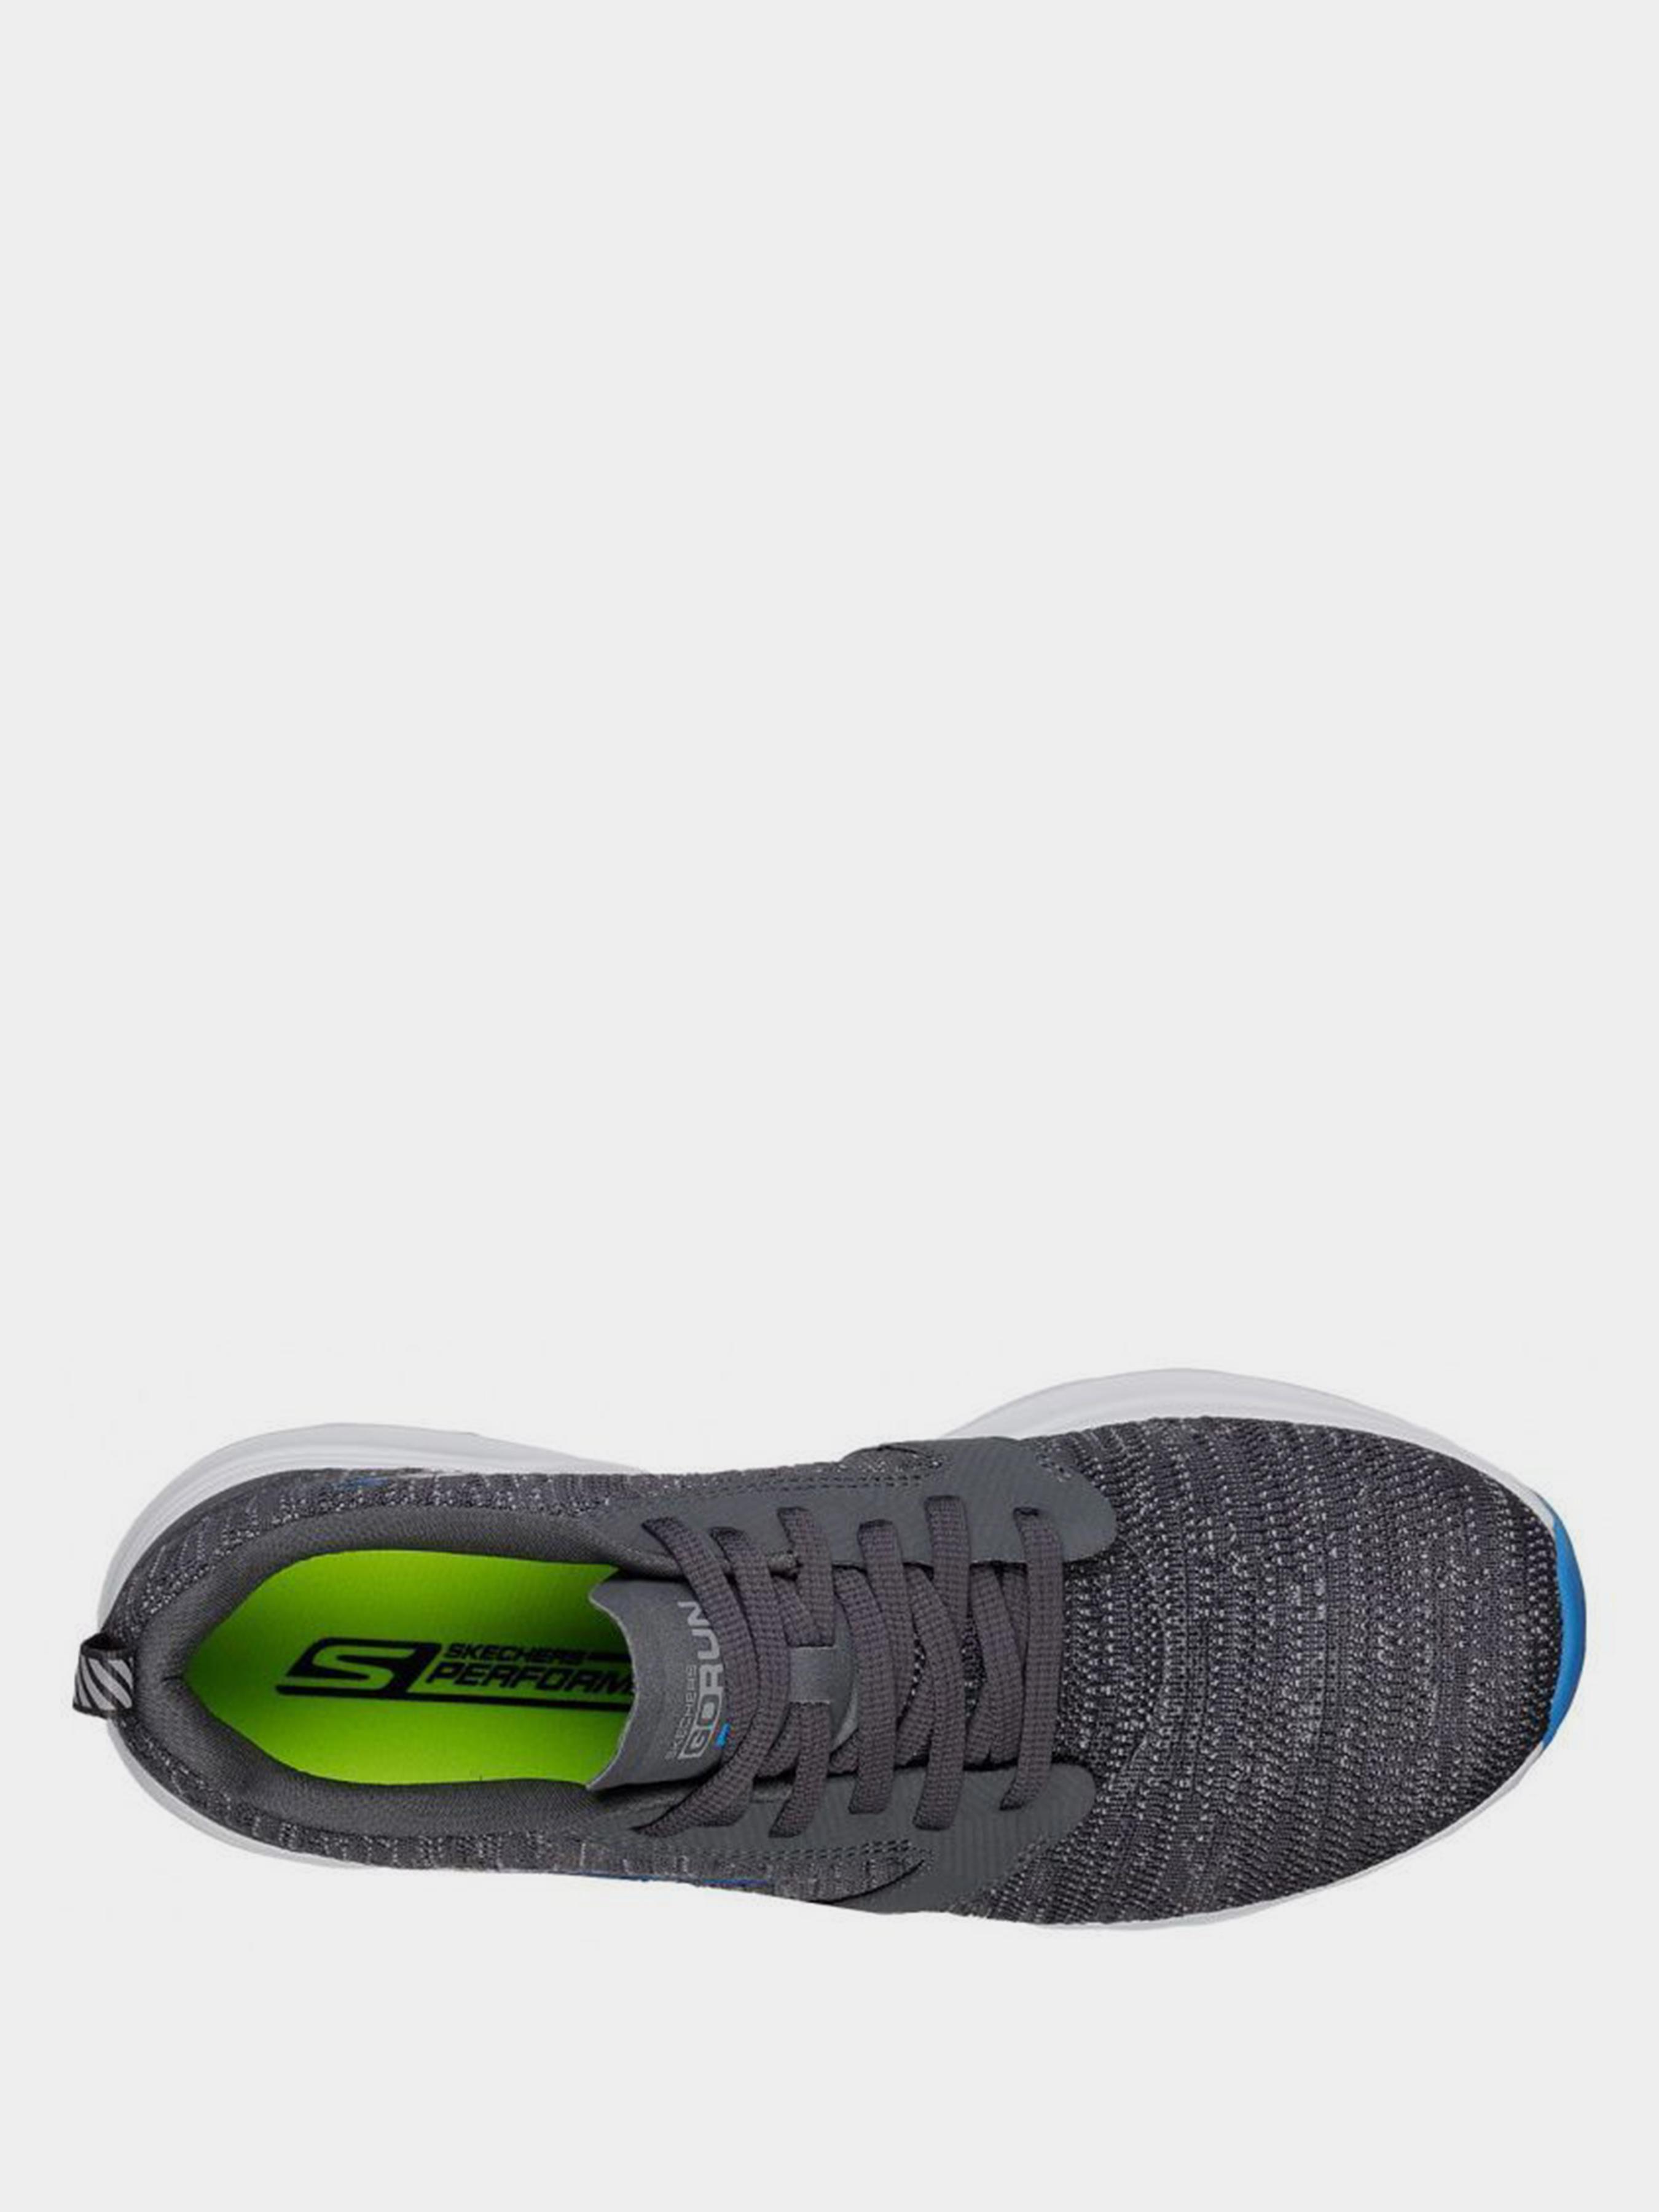 Кроссовки для мужчин Skechers KM3145 купить обувь, 2017